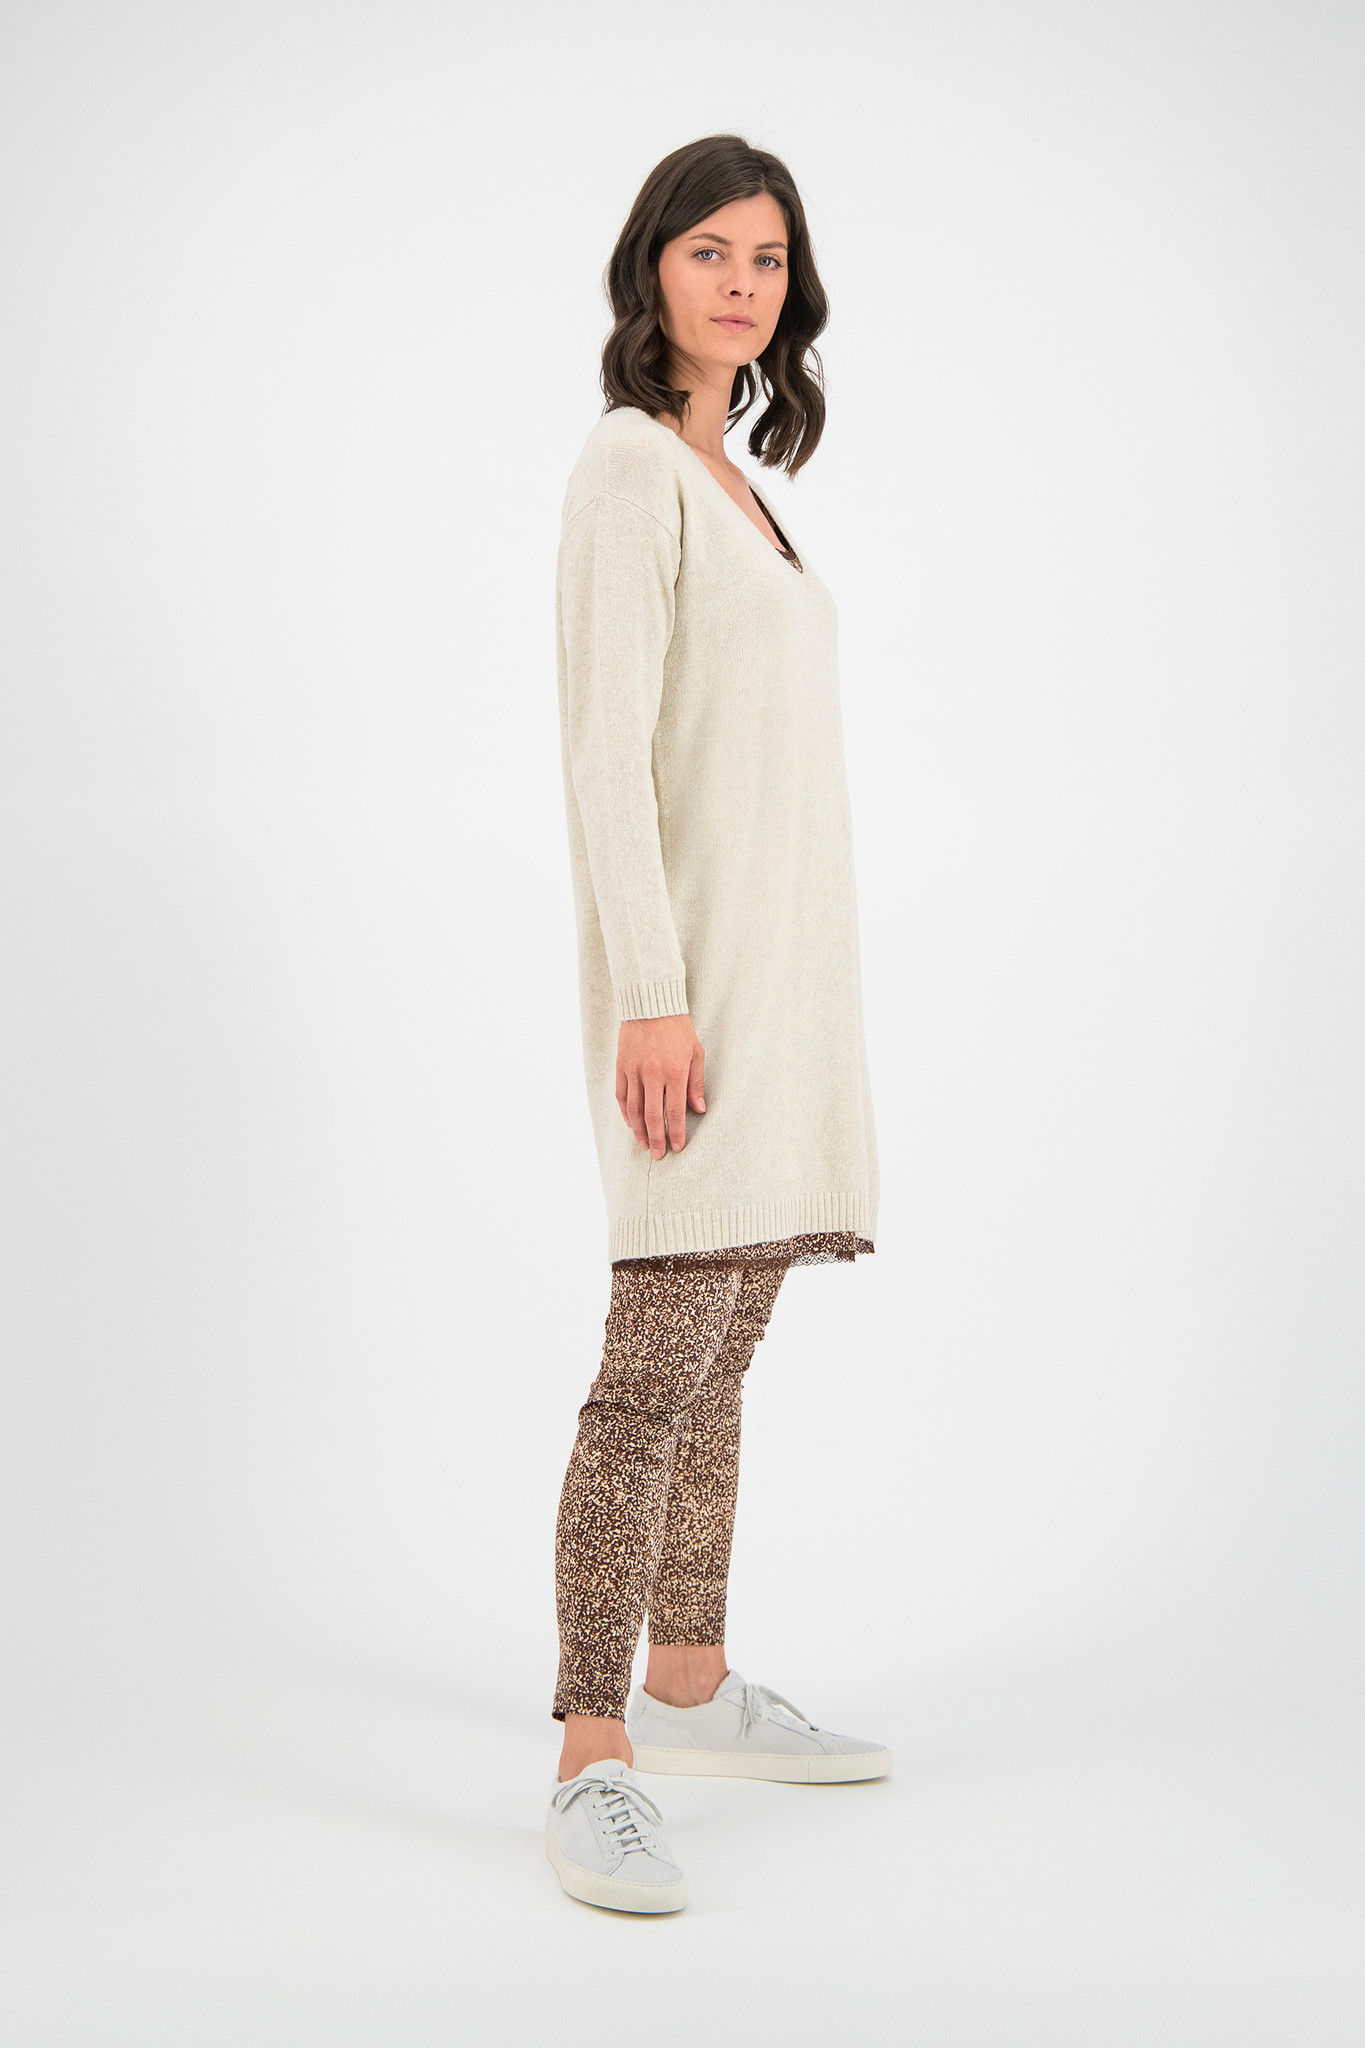 SYLVER Gravel Silky Jersey Pants - Brown